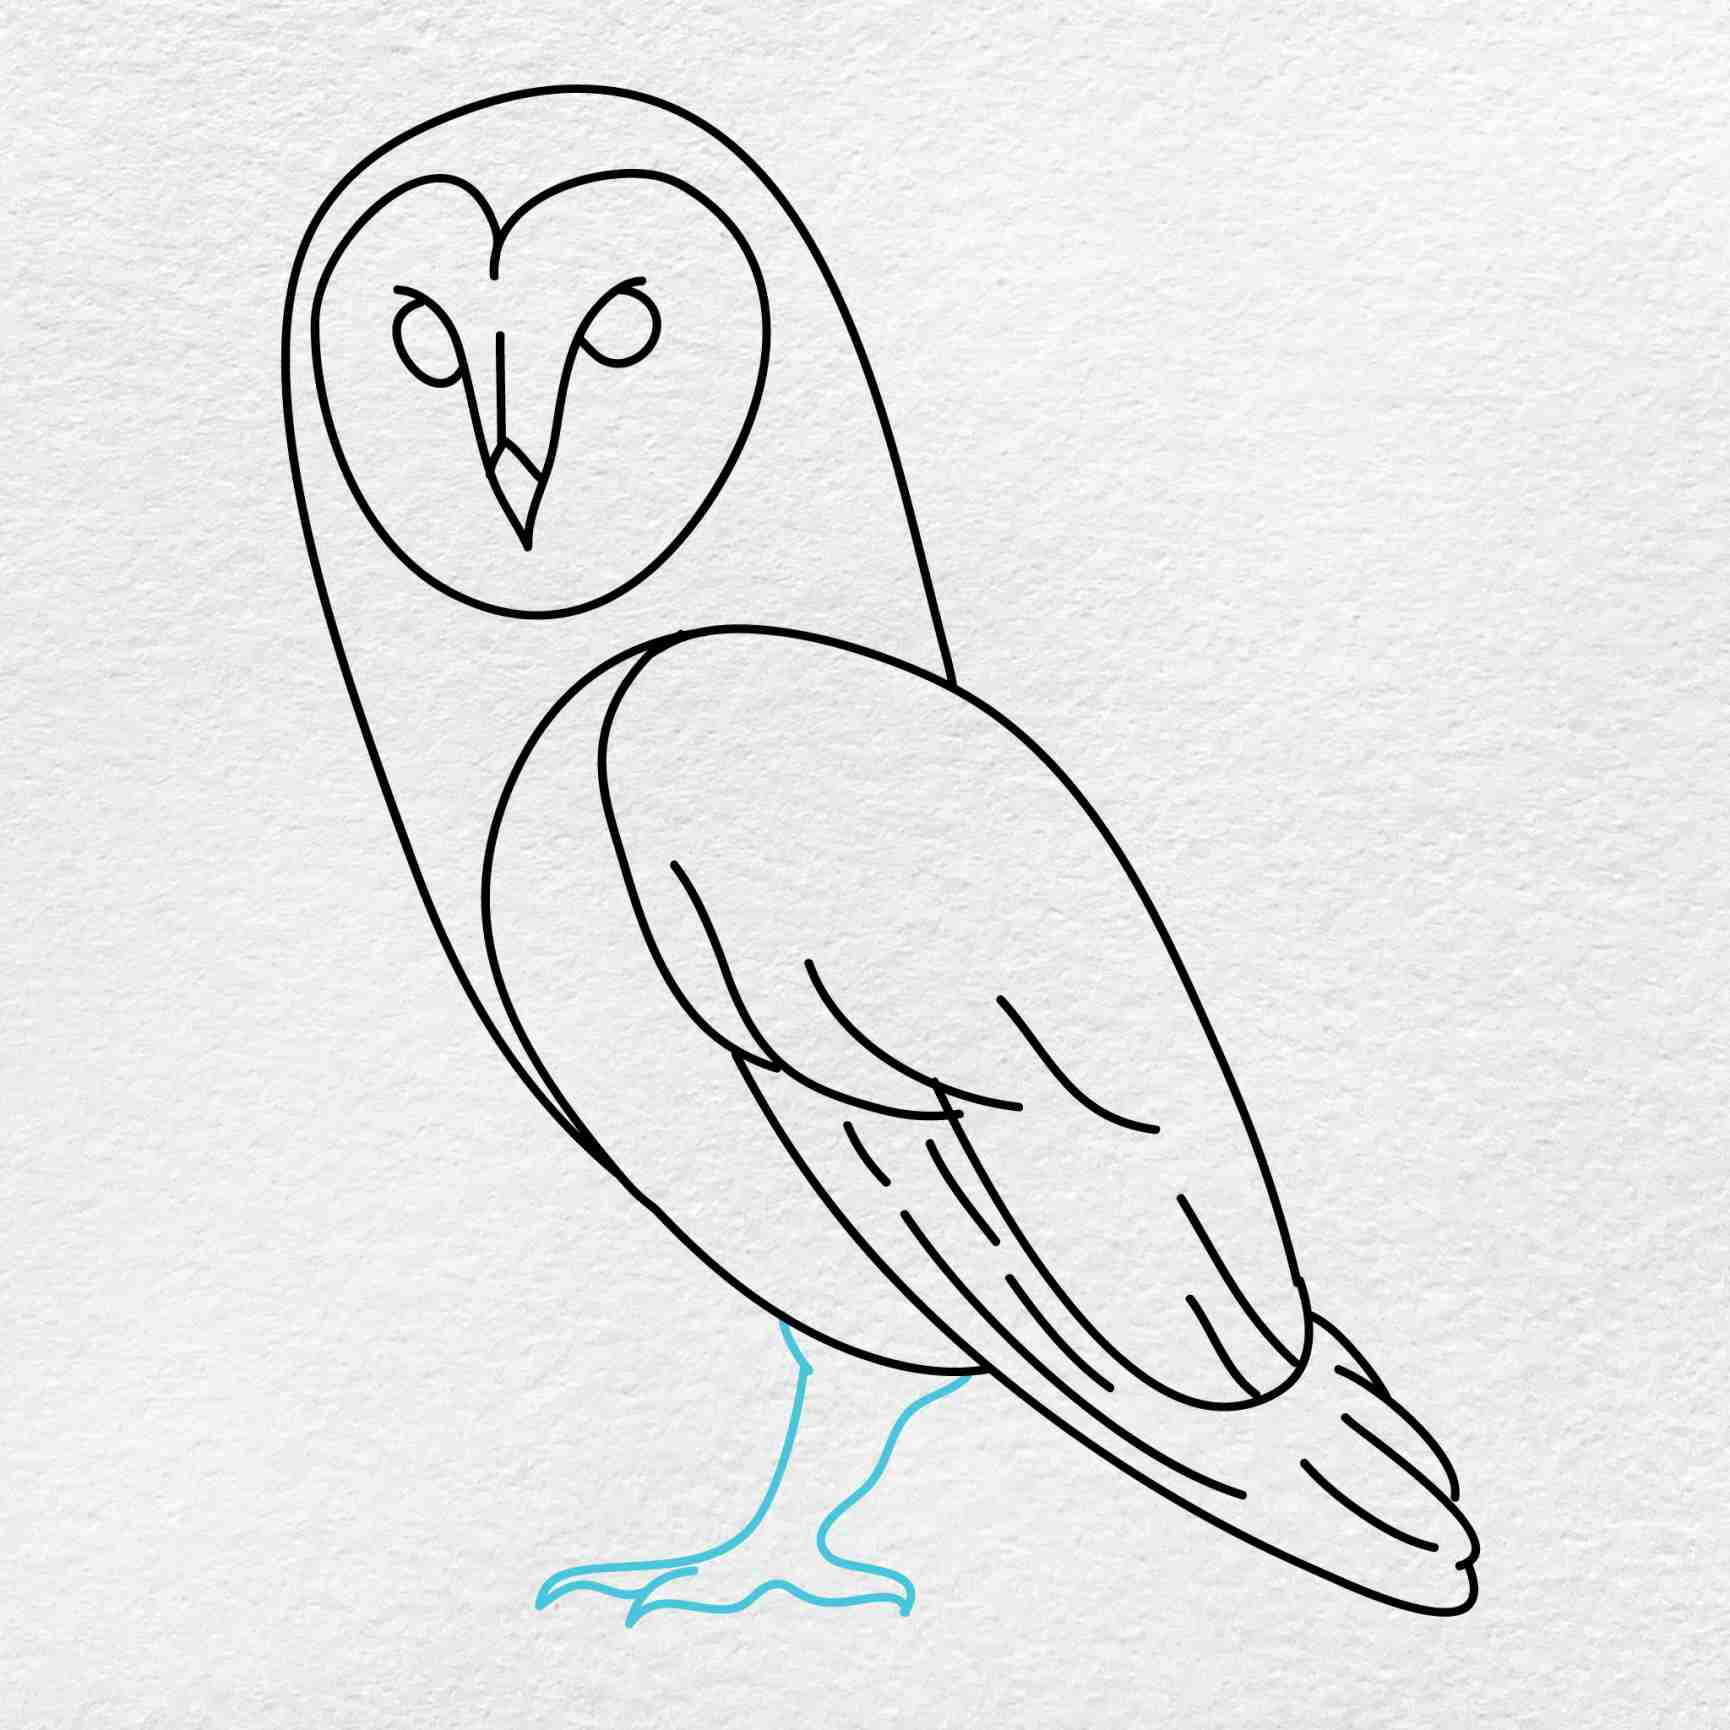 Barn Owl Drawing: Step 7